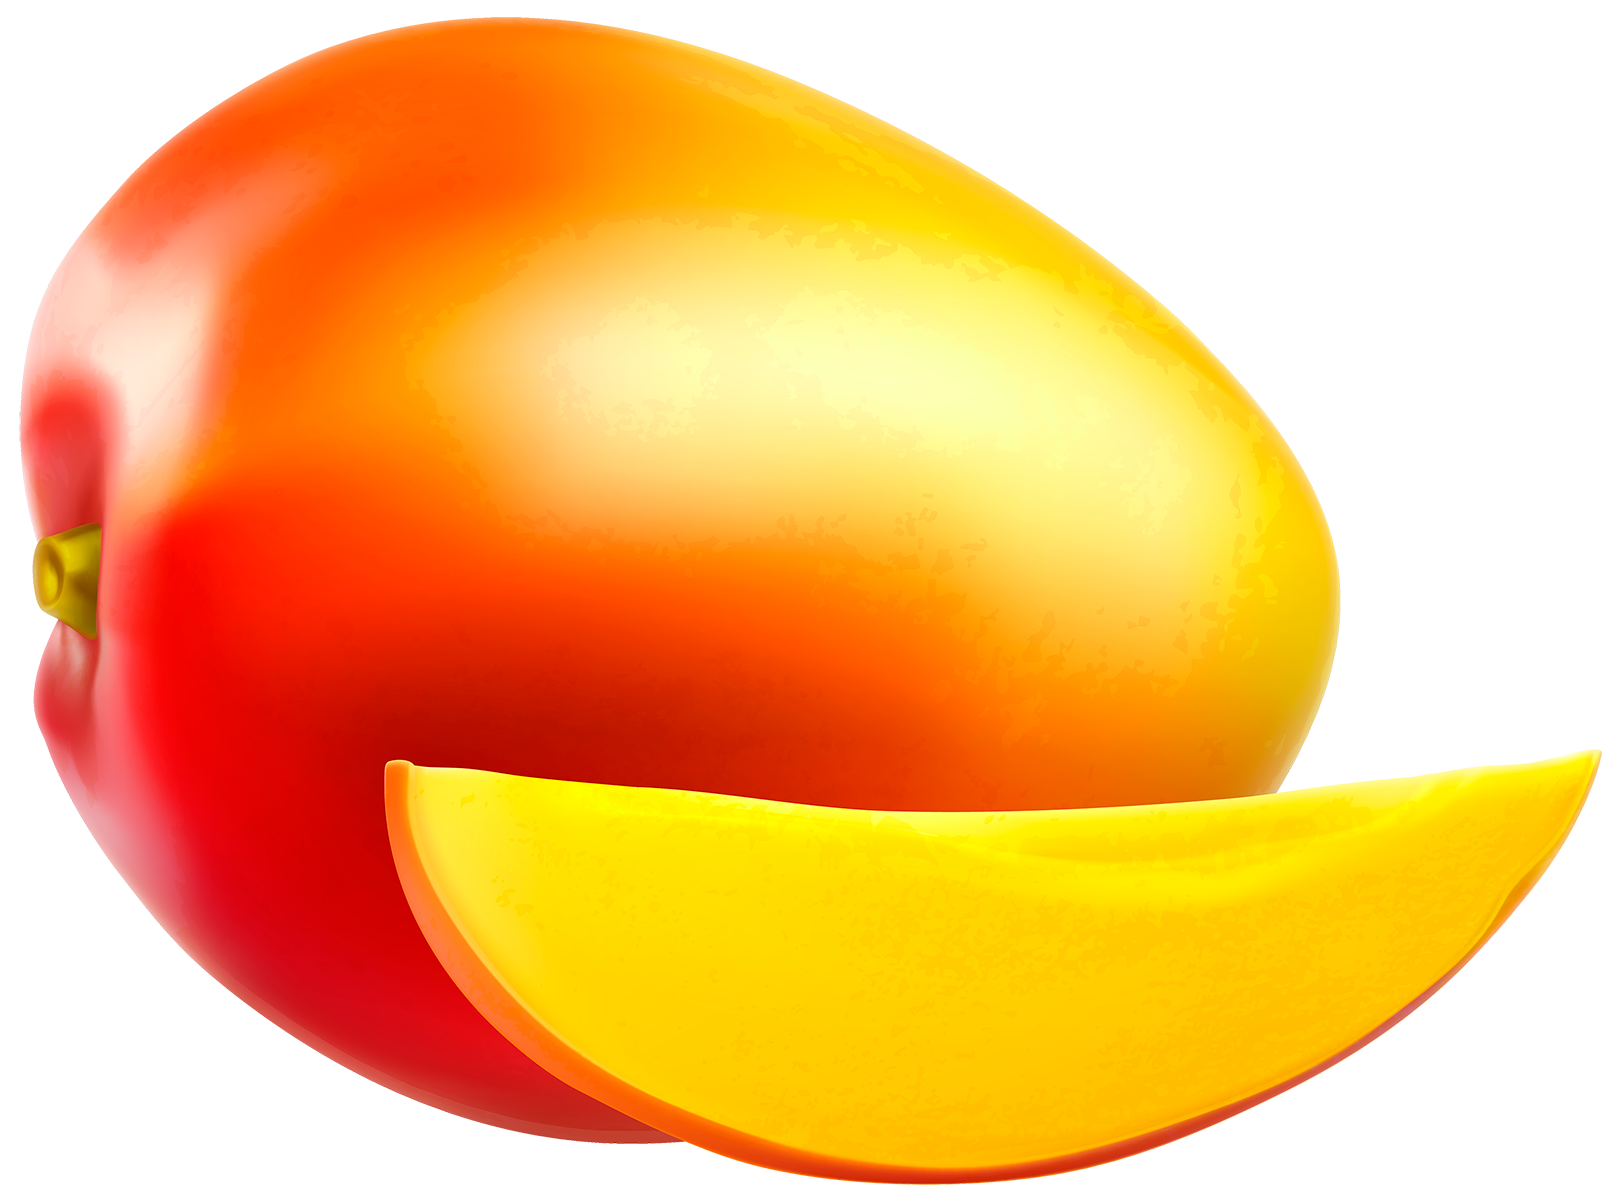 Манго - фрукты, манго